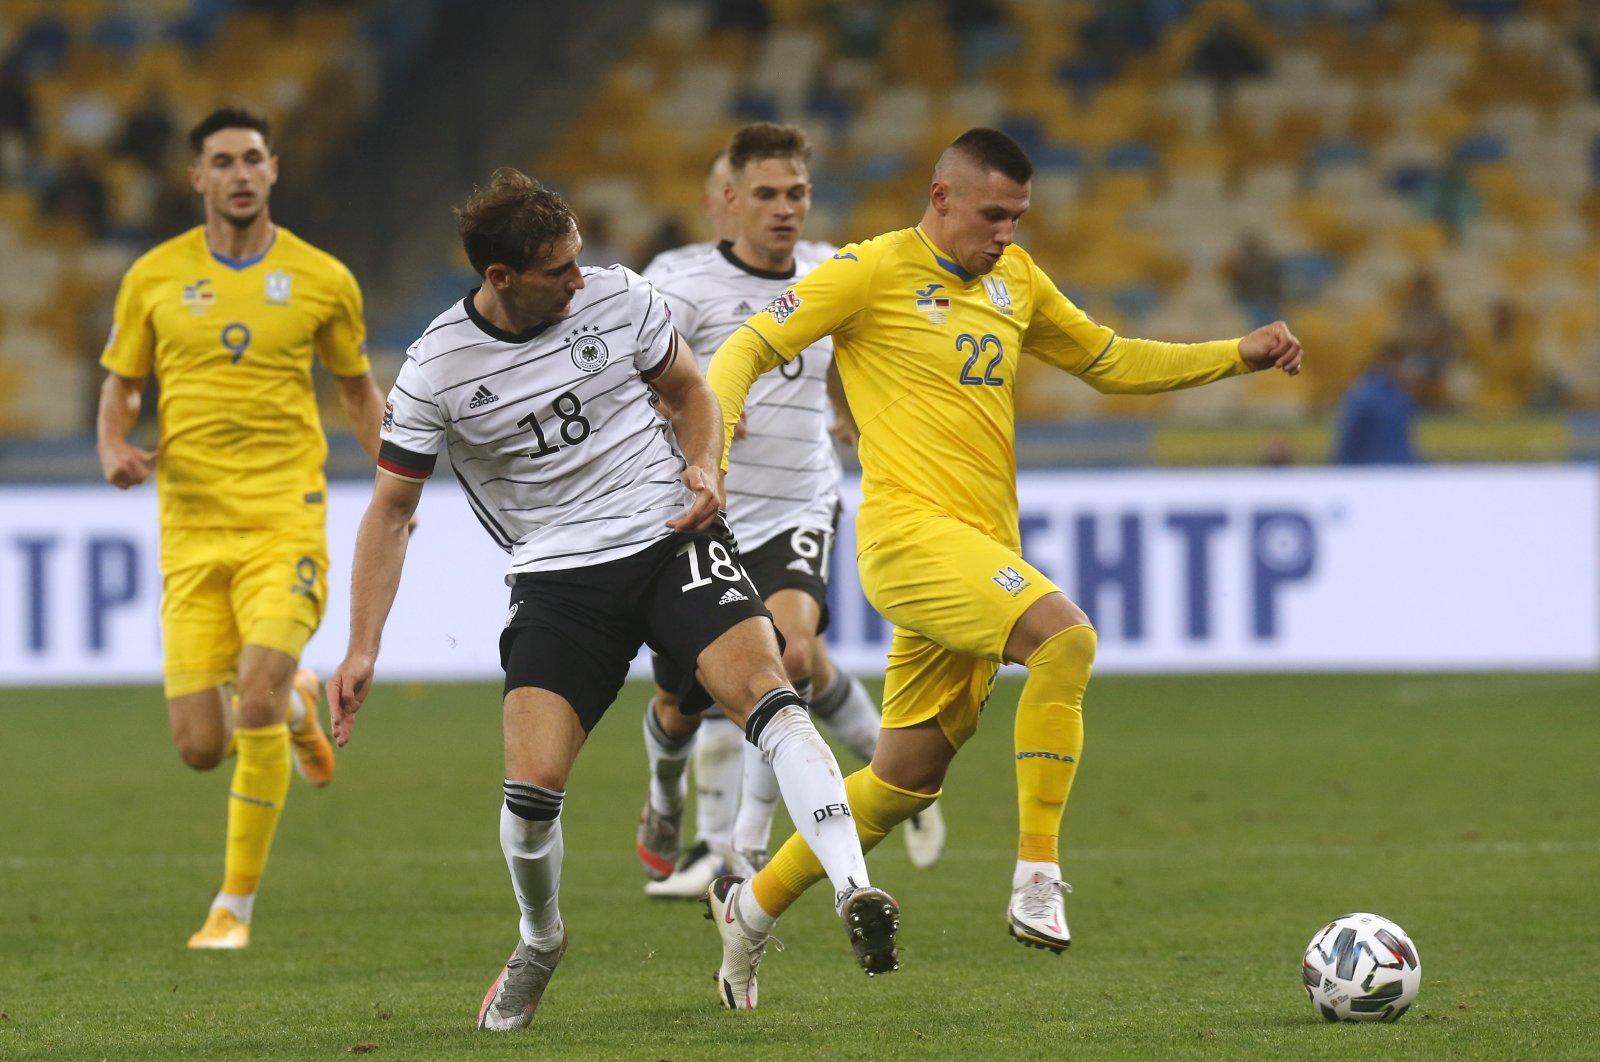 Germany's Leon Goretzka and Ukraine's Oleksandr Zubkov challenge for the ball, in Kyiv, Ukraine, Oct. 10, 2020. (AP Photo)